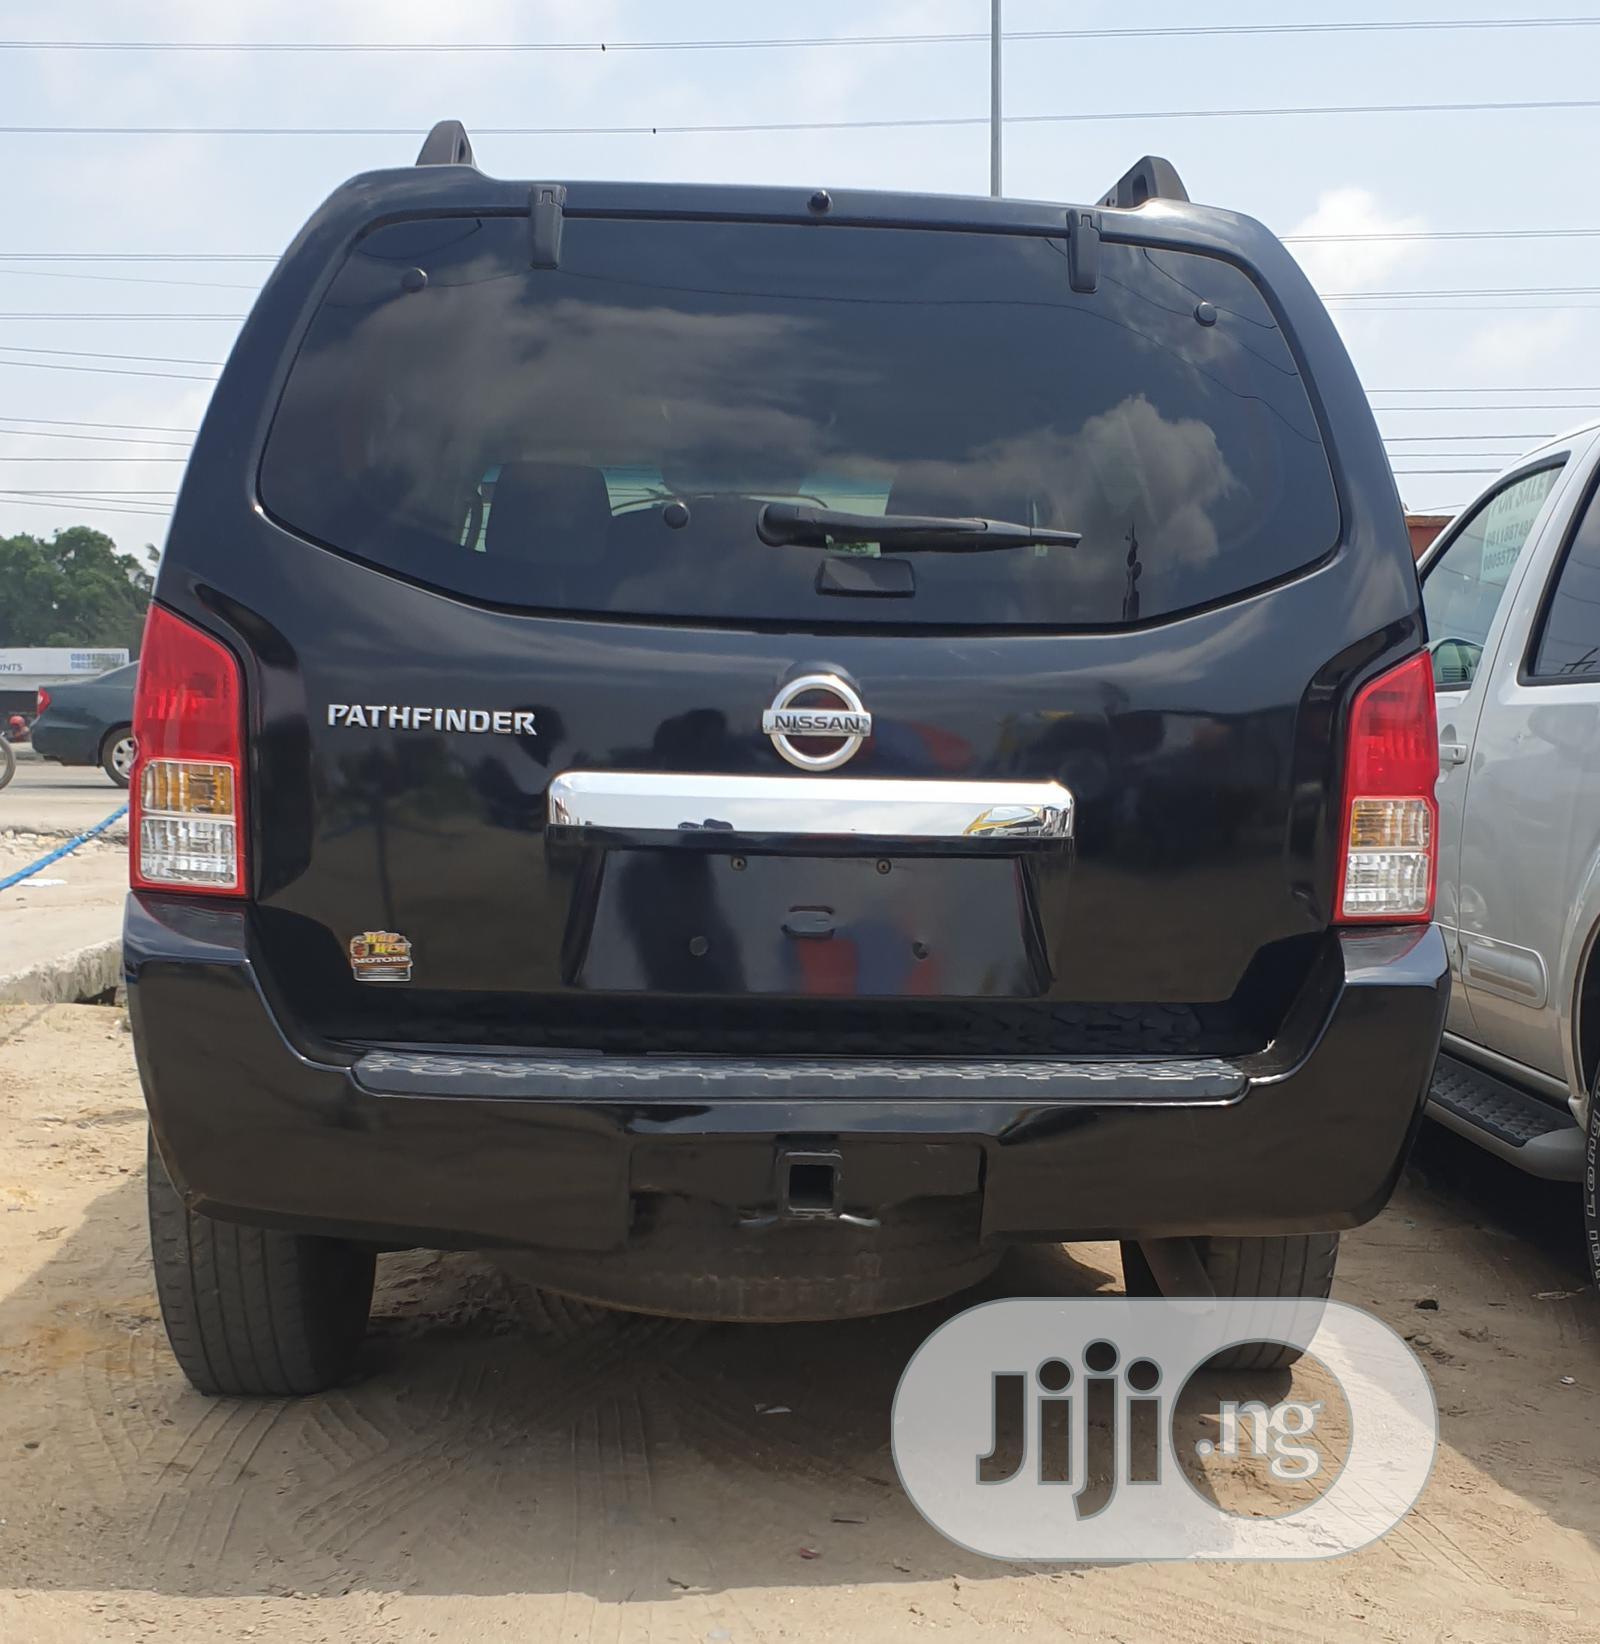 Nissan Pathfinder 2007 Black | Cars for sale in Lekki, Lagos State, Nigeria